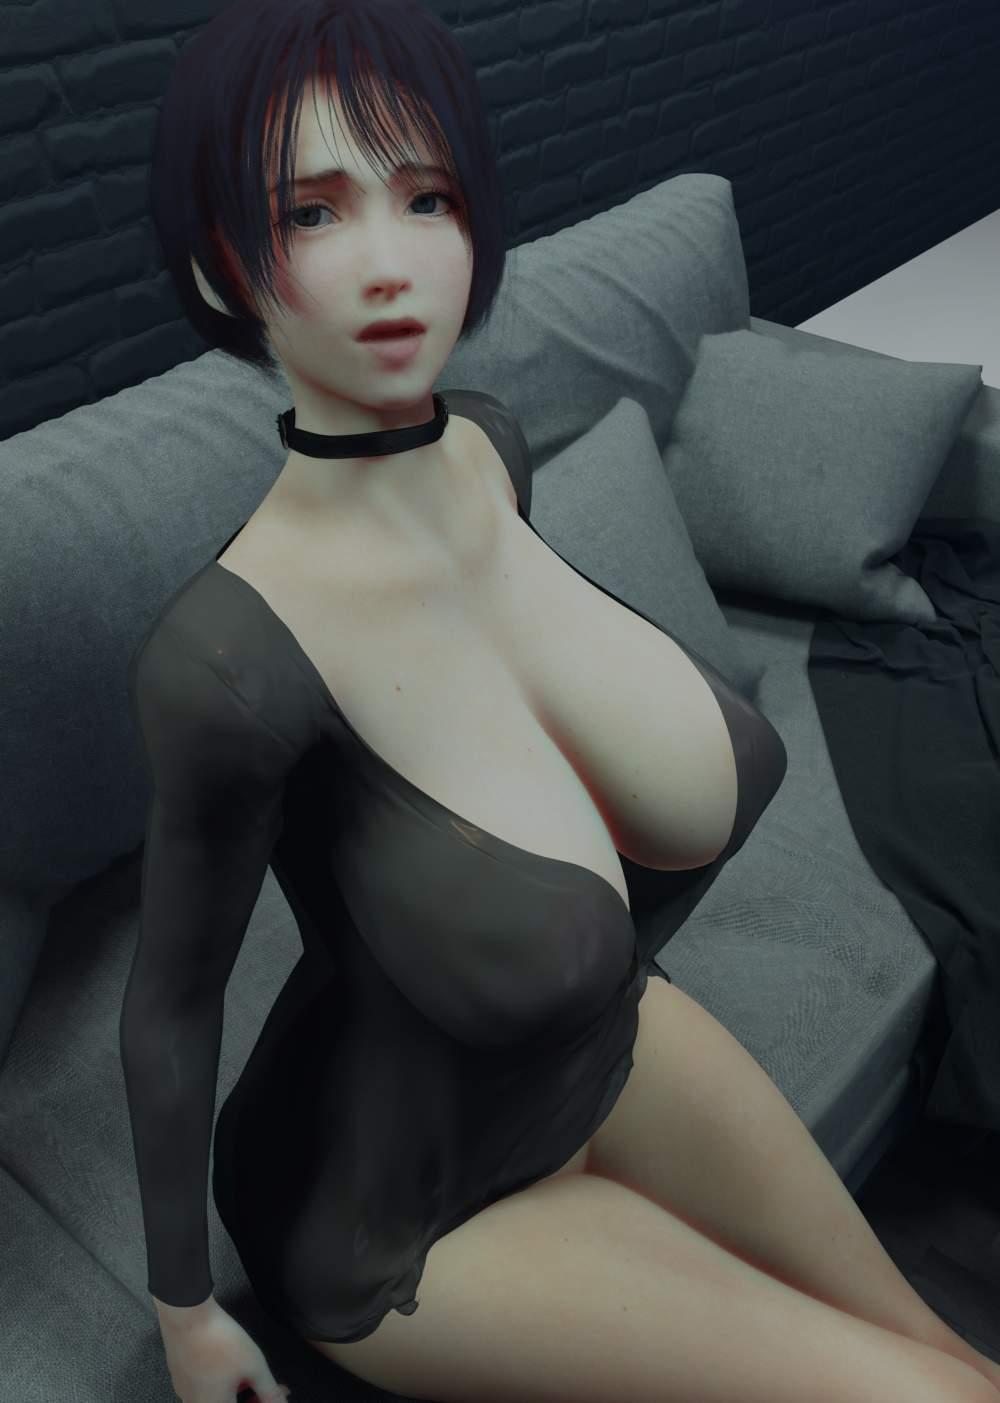 Exprational大师:4K超逼真壁纸级3D同人动画 CG/画集-第2张